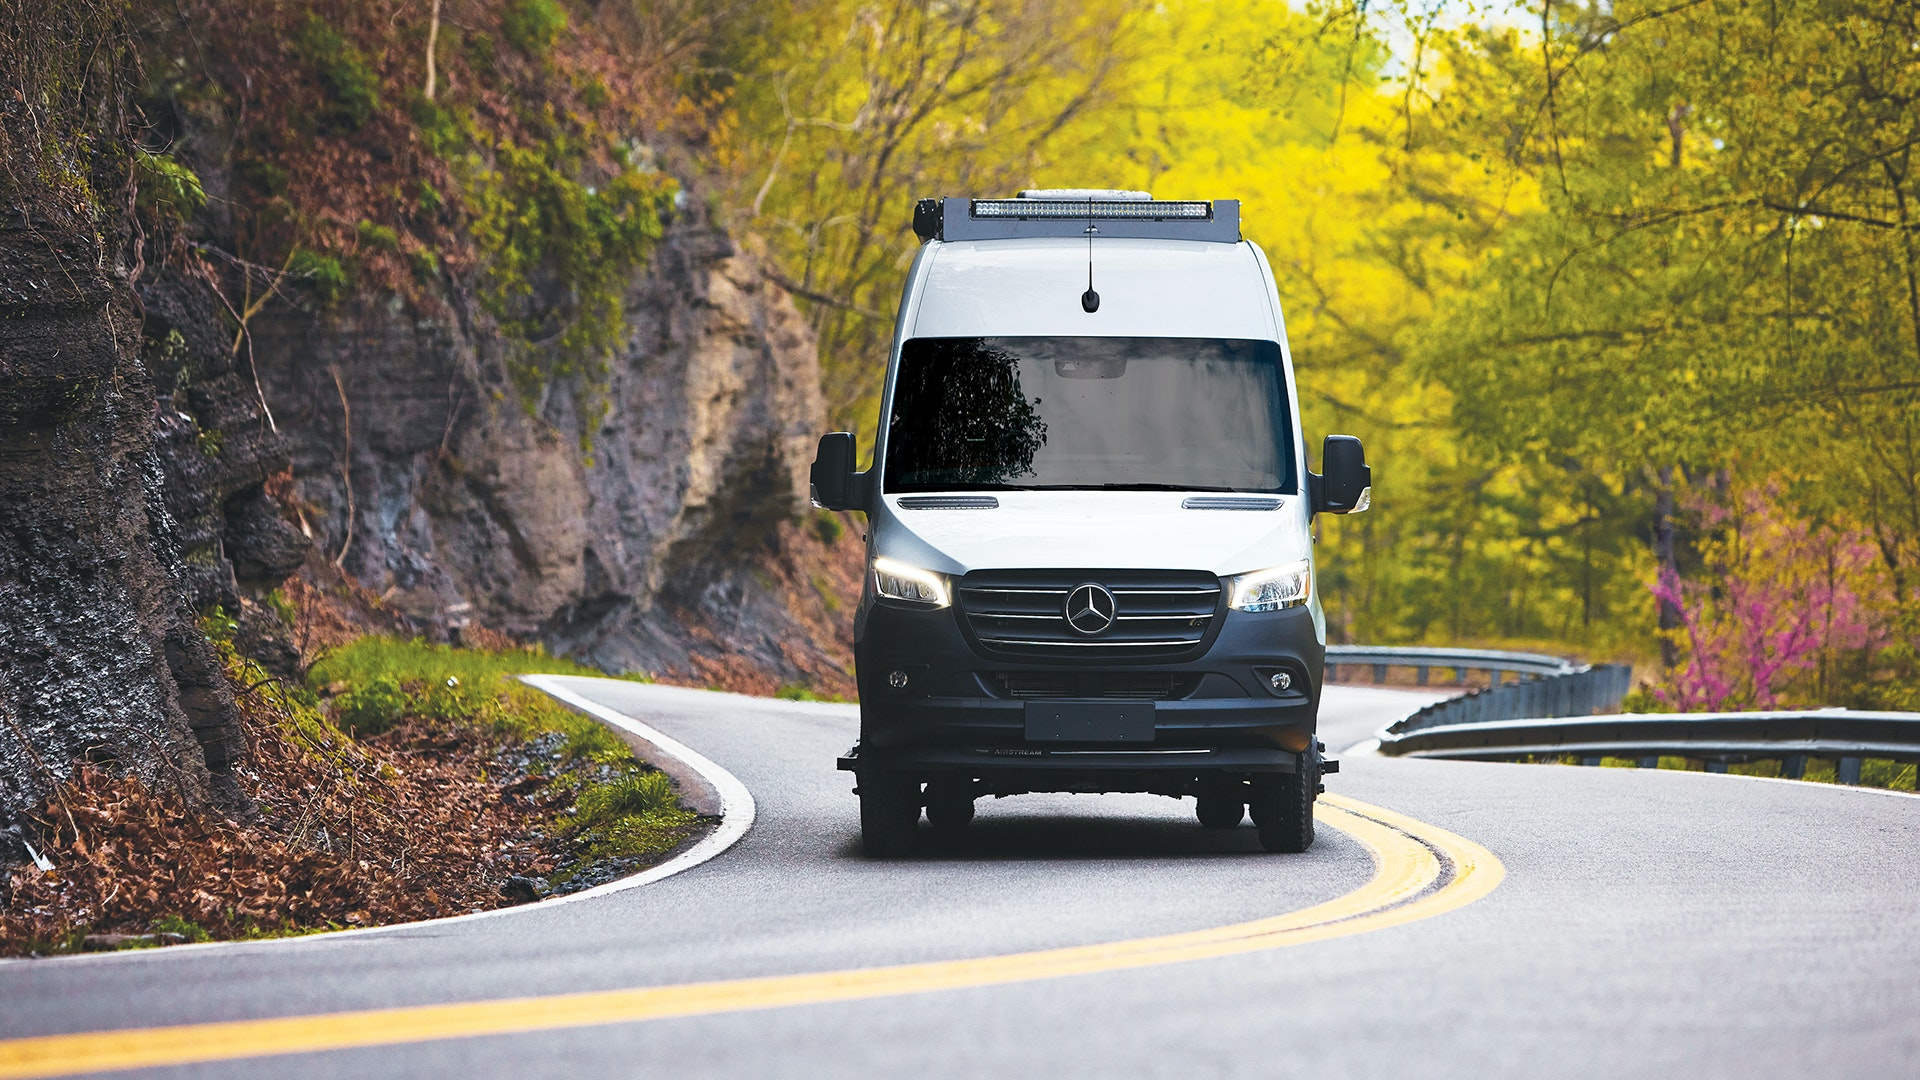 Airstream-Interstate-24X-Touring-Coach-Adventure-Van-All-New-Interstate